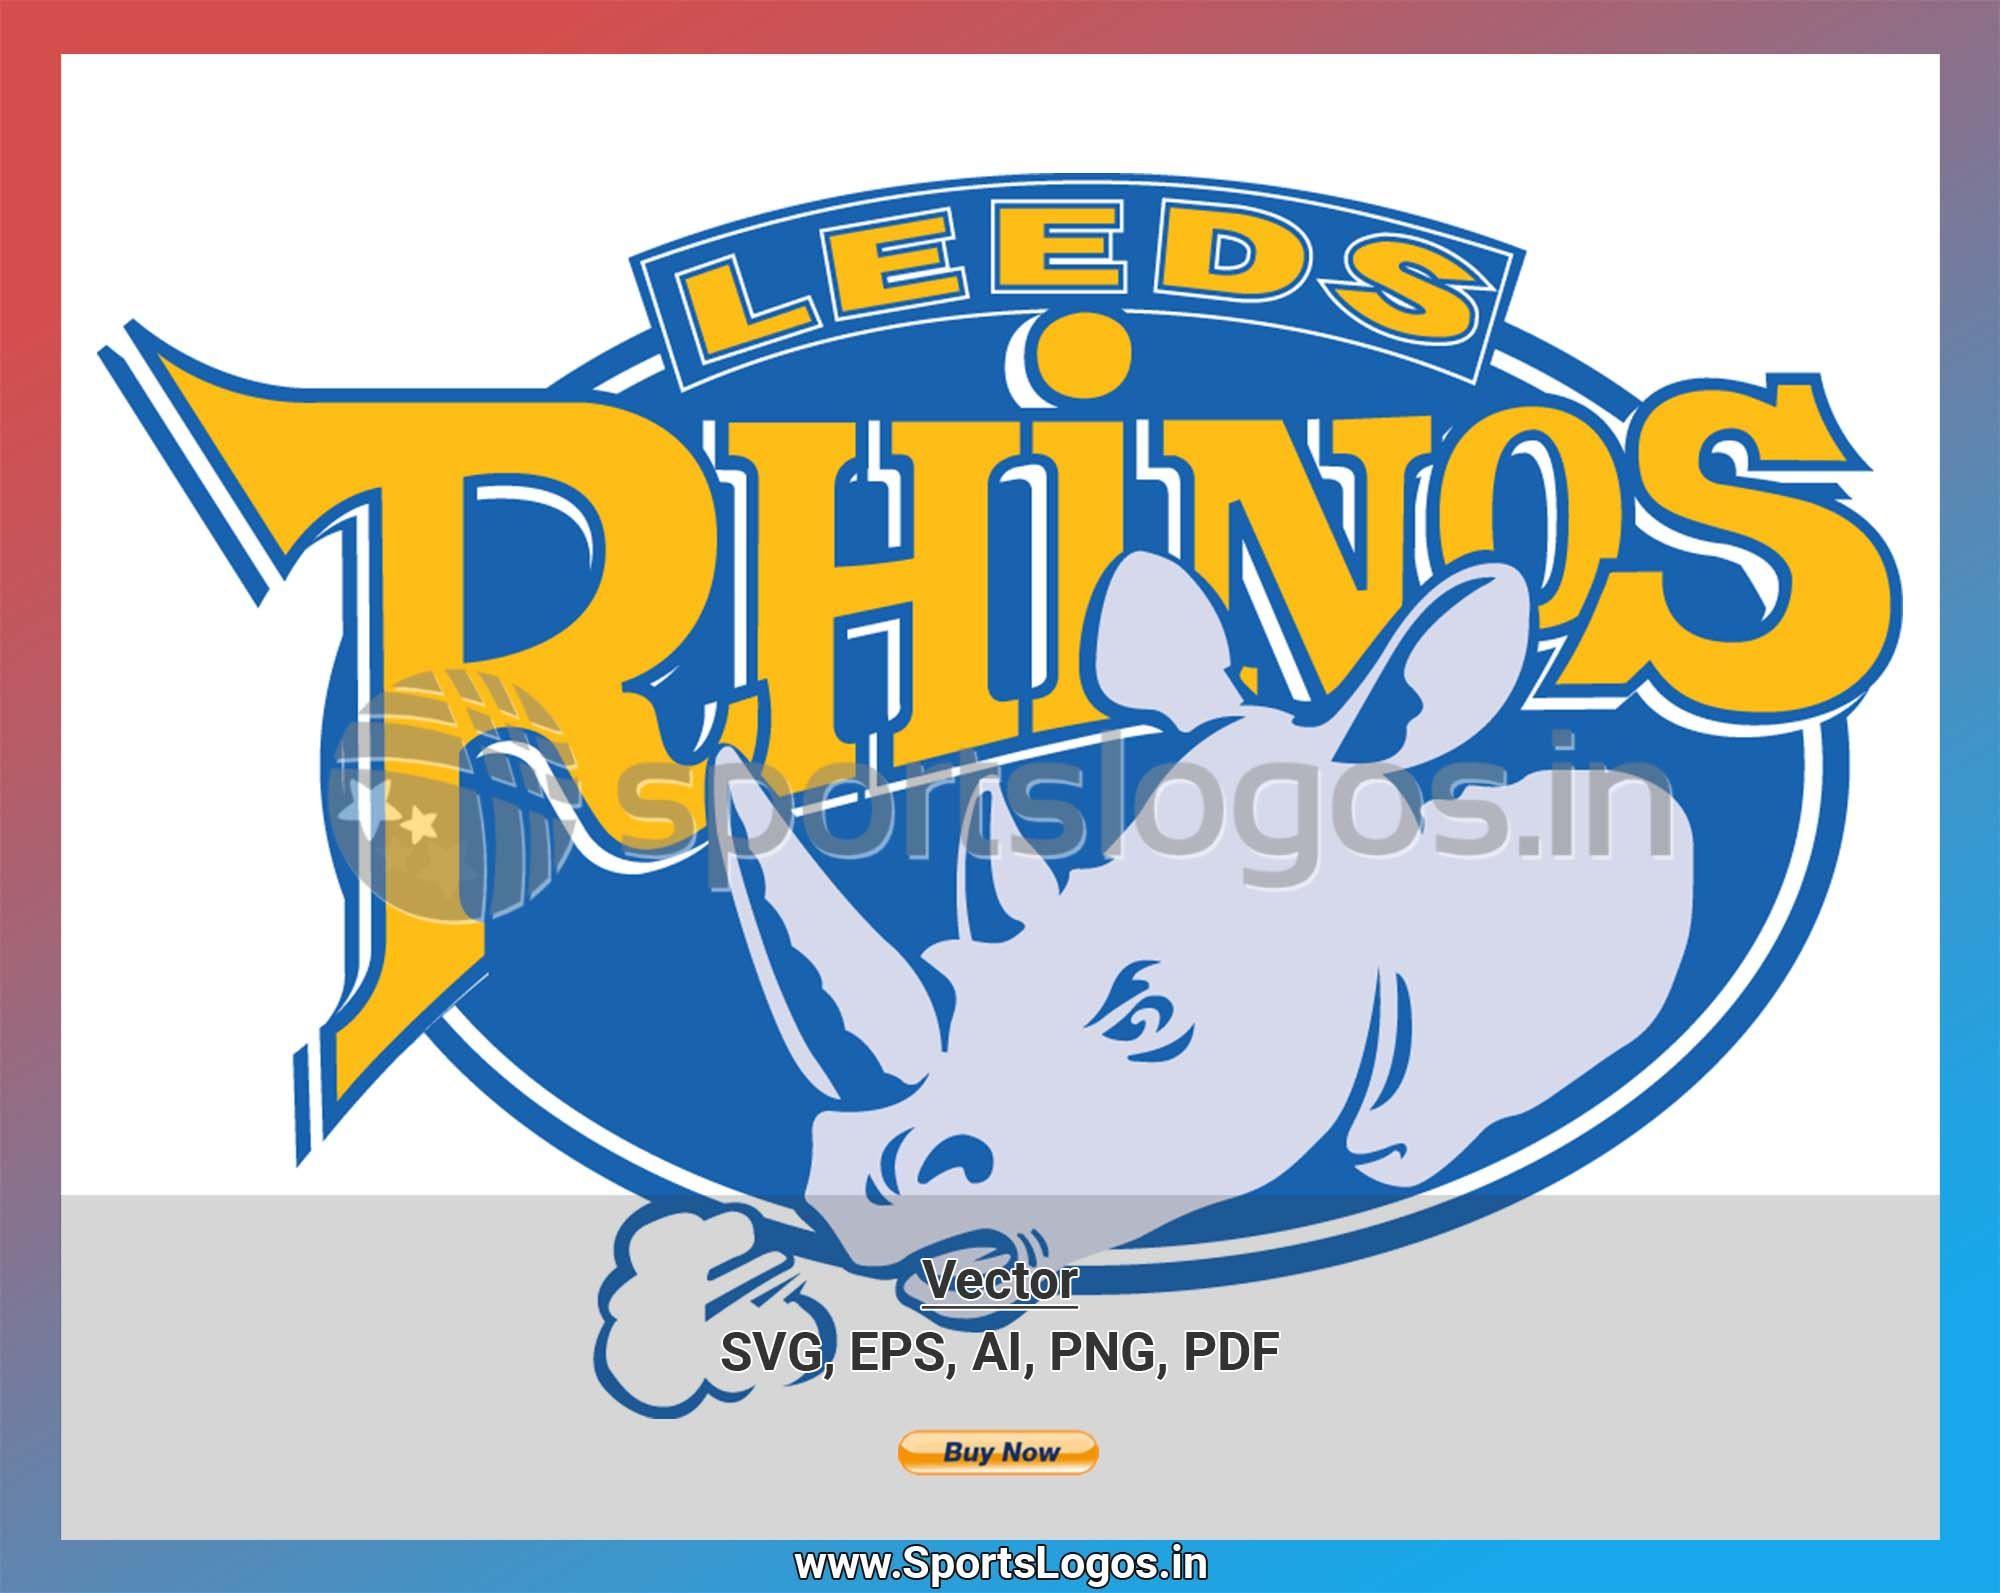 Leeds Rhinos Misc. Sports Vector SVG Logo in 5 formats